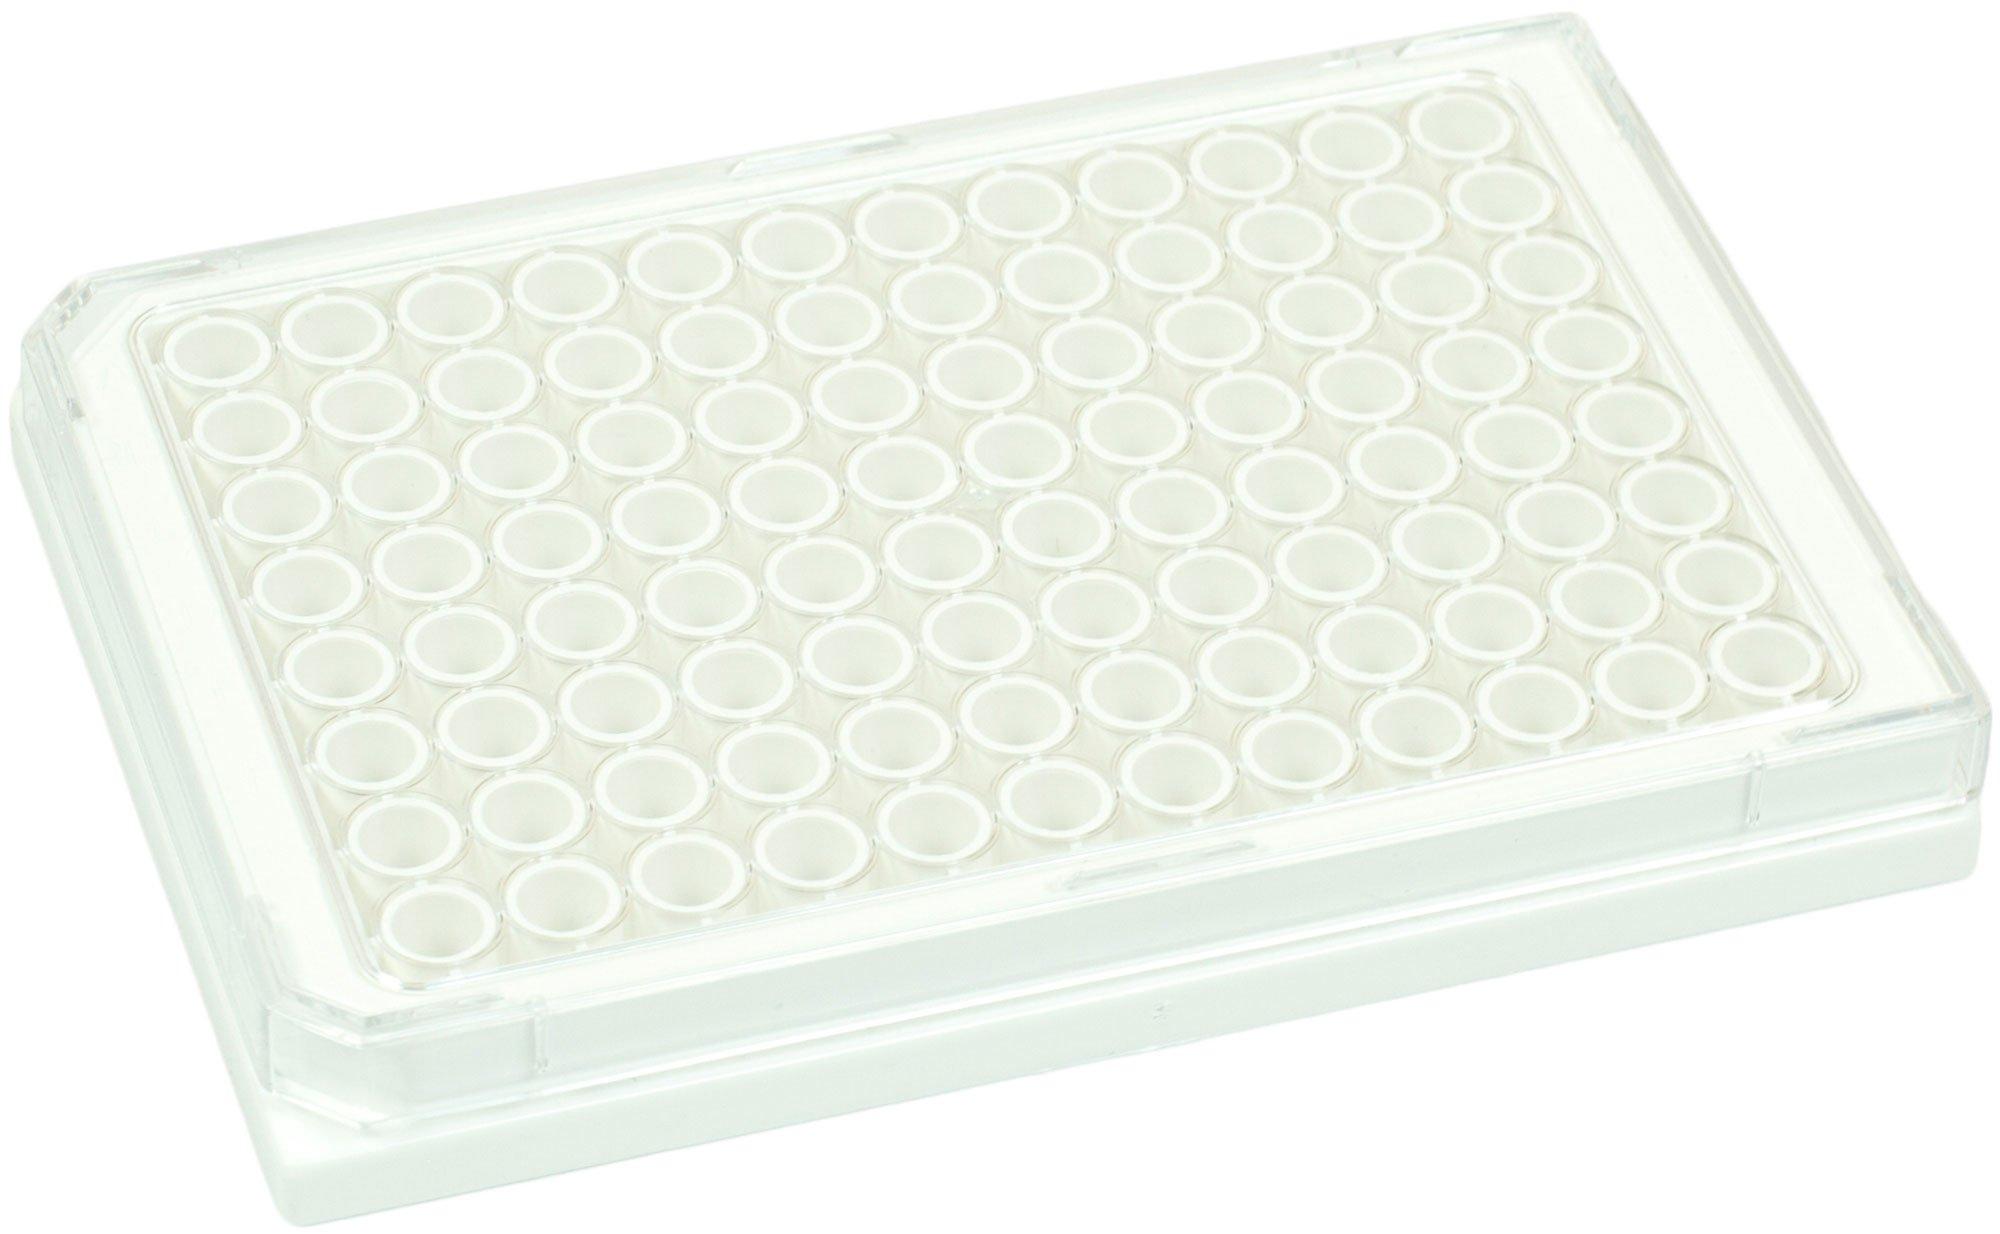 BRANDplates cellGrade Premium Treated Sterile Surface 96-Well Plate - White, Transparent F-Bottom